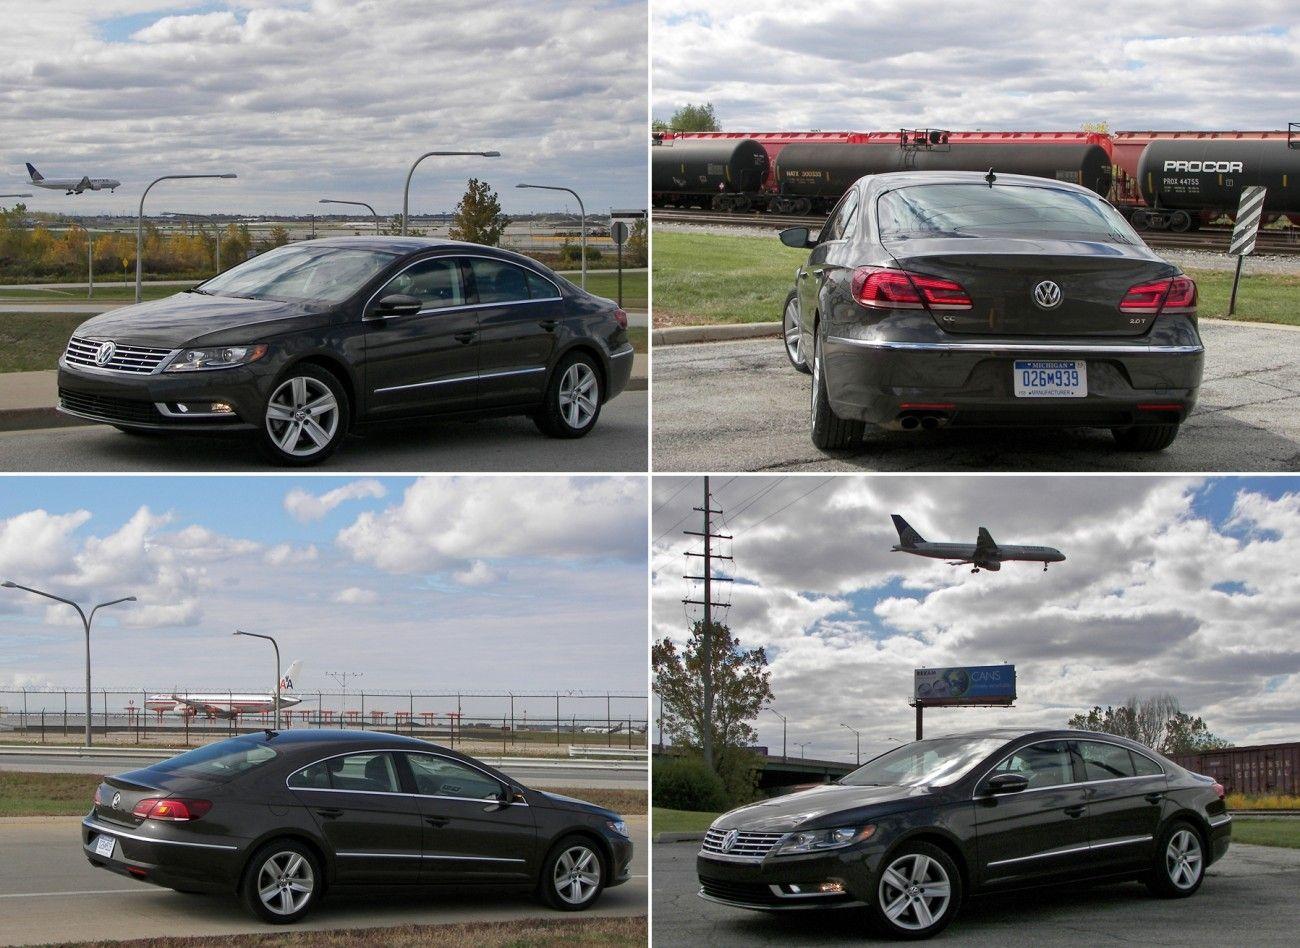 2013 Volkswagen CC Sport Planes, Trains, Automobiles